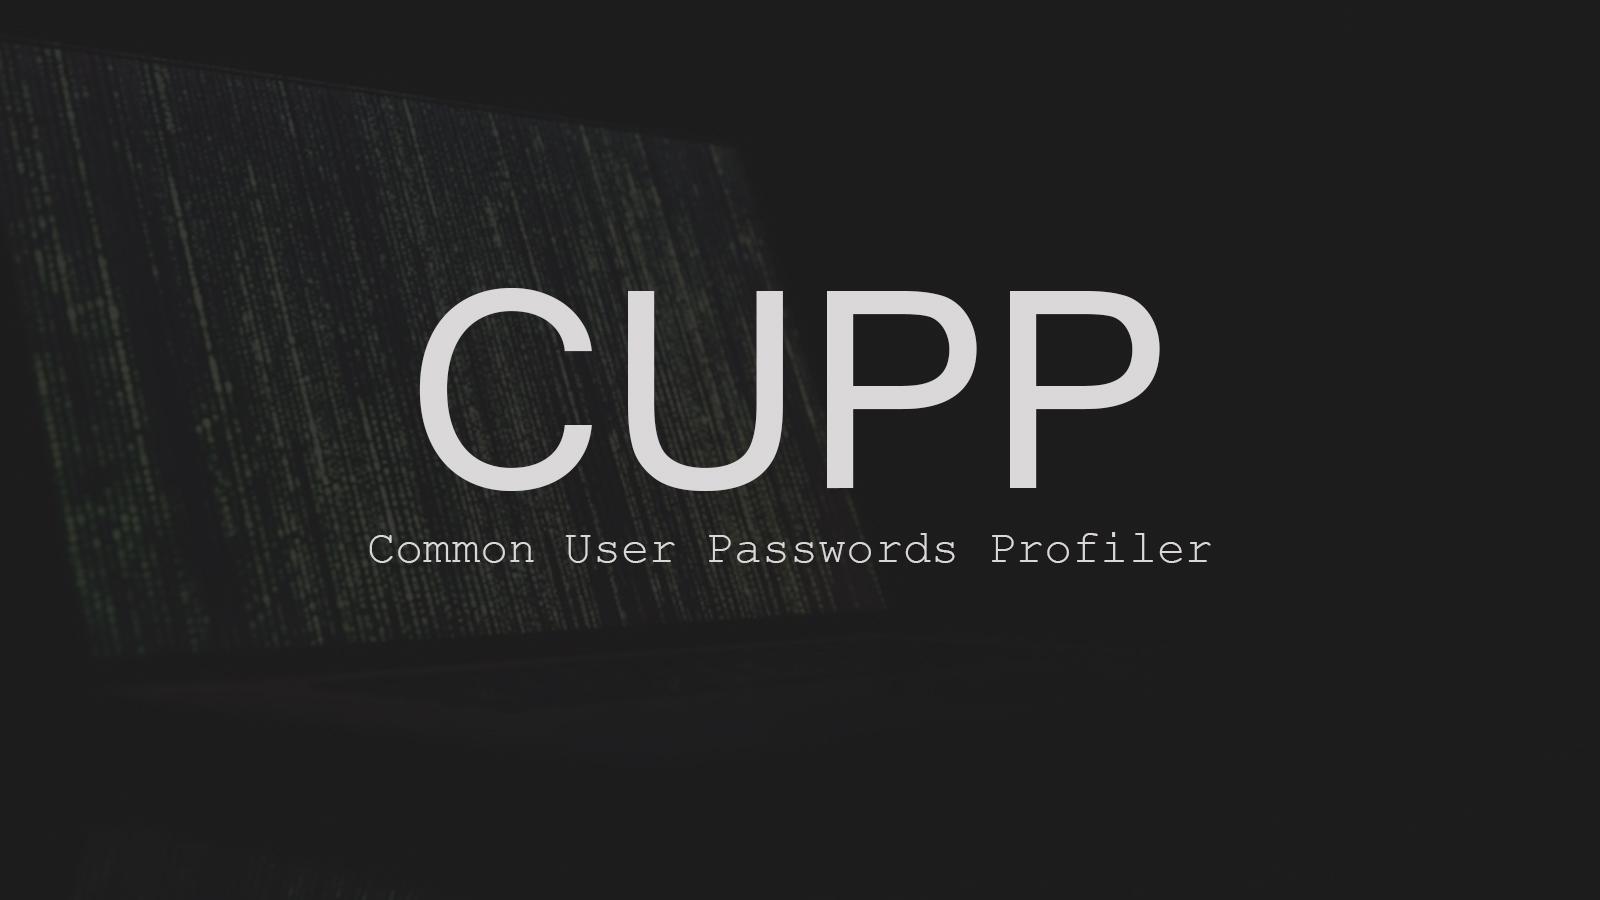 CUPP - Common User Passwords Profiler